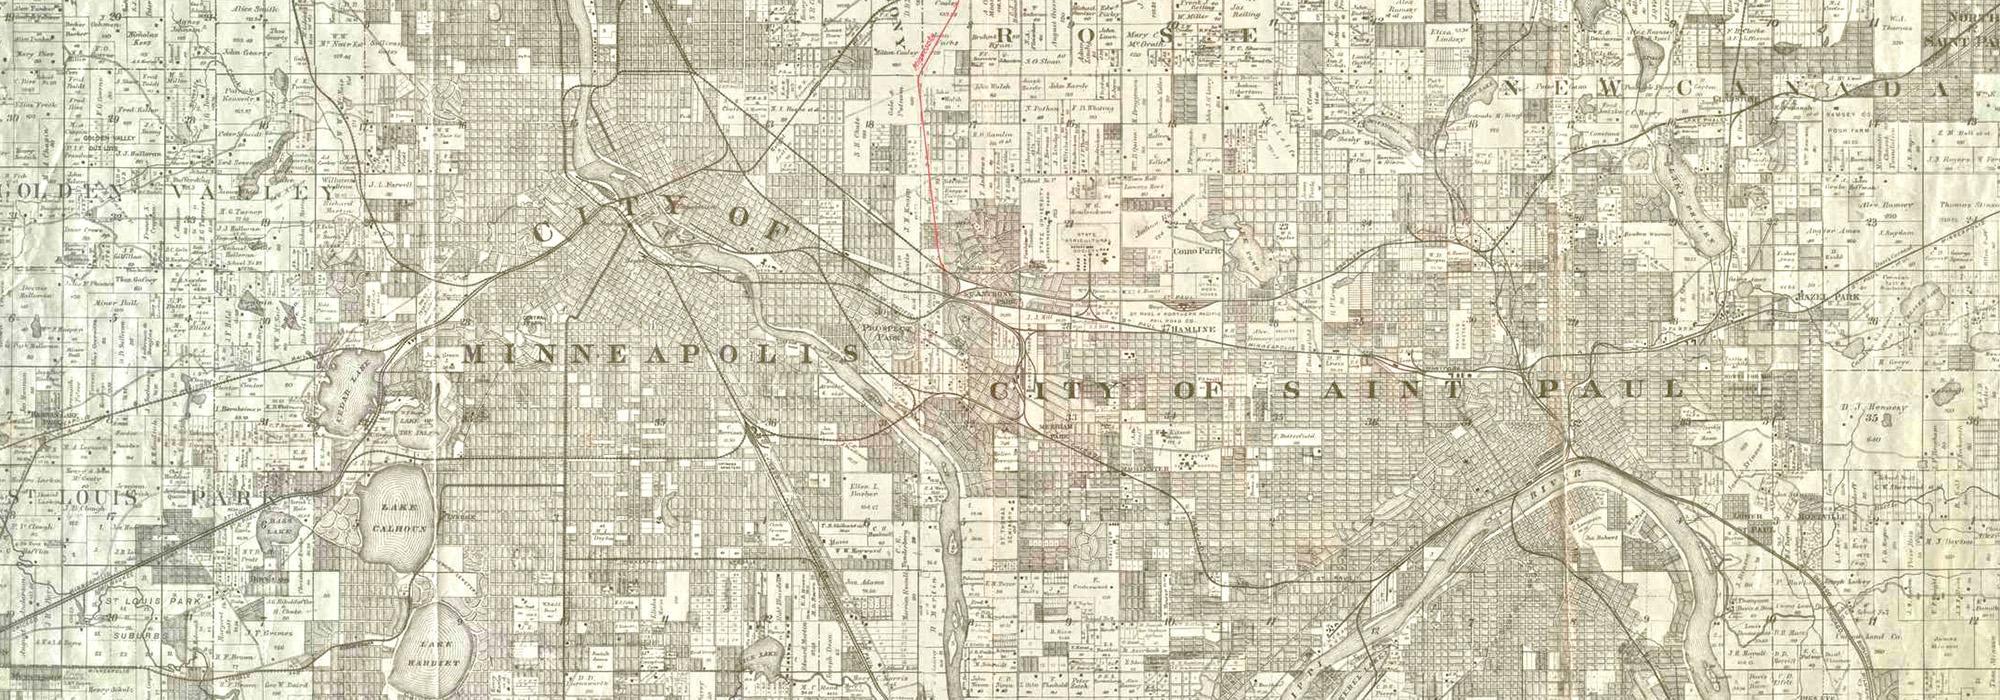 MN_StPaul-Minneapolis_HistoricMap_byThomasLowry-courtesyUniversityOfMinnesotaLibraries_1888_001_Hero.jpg